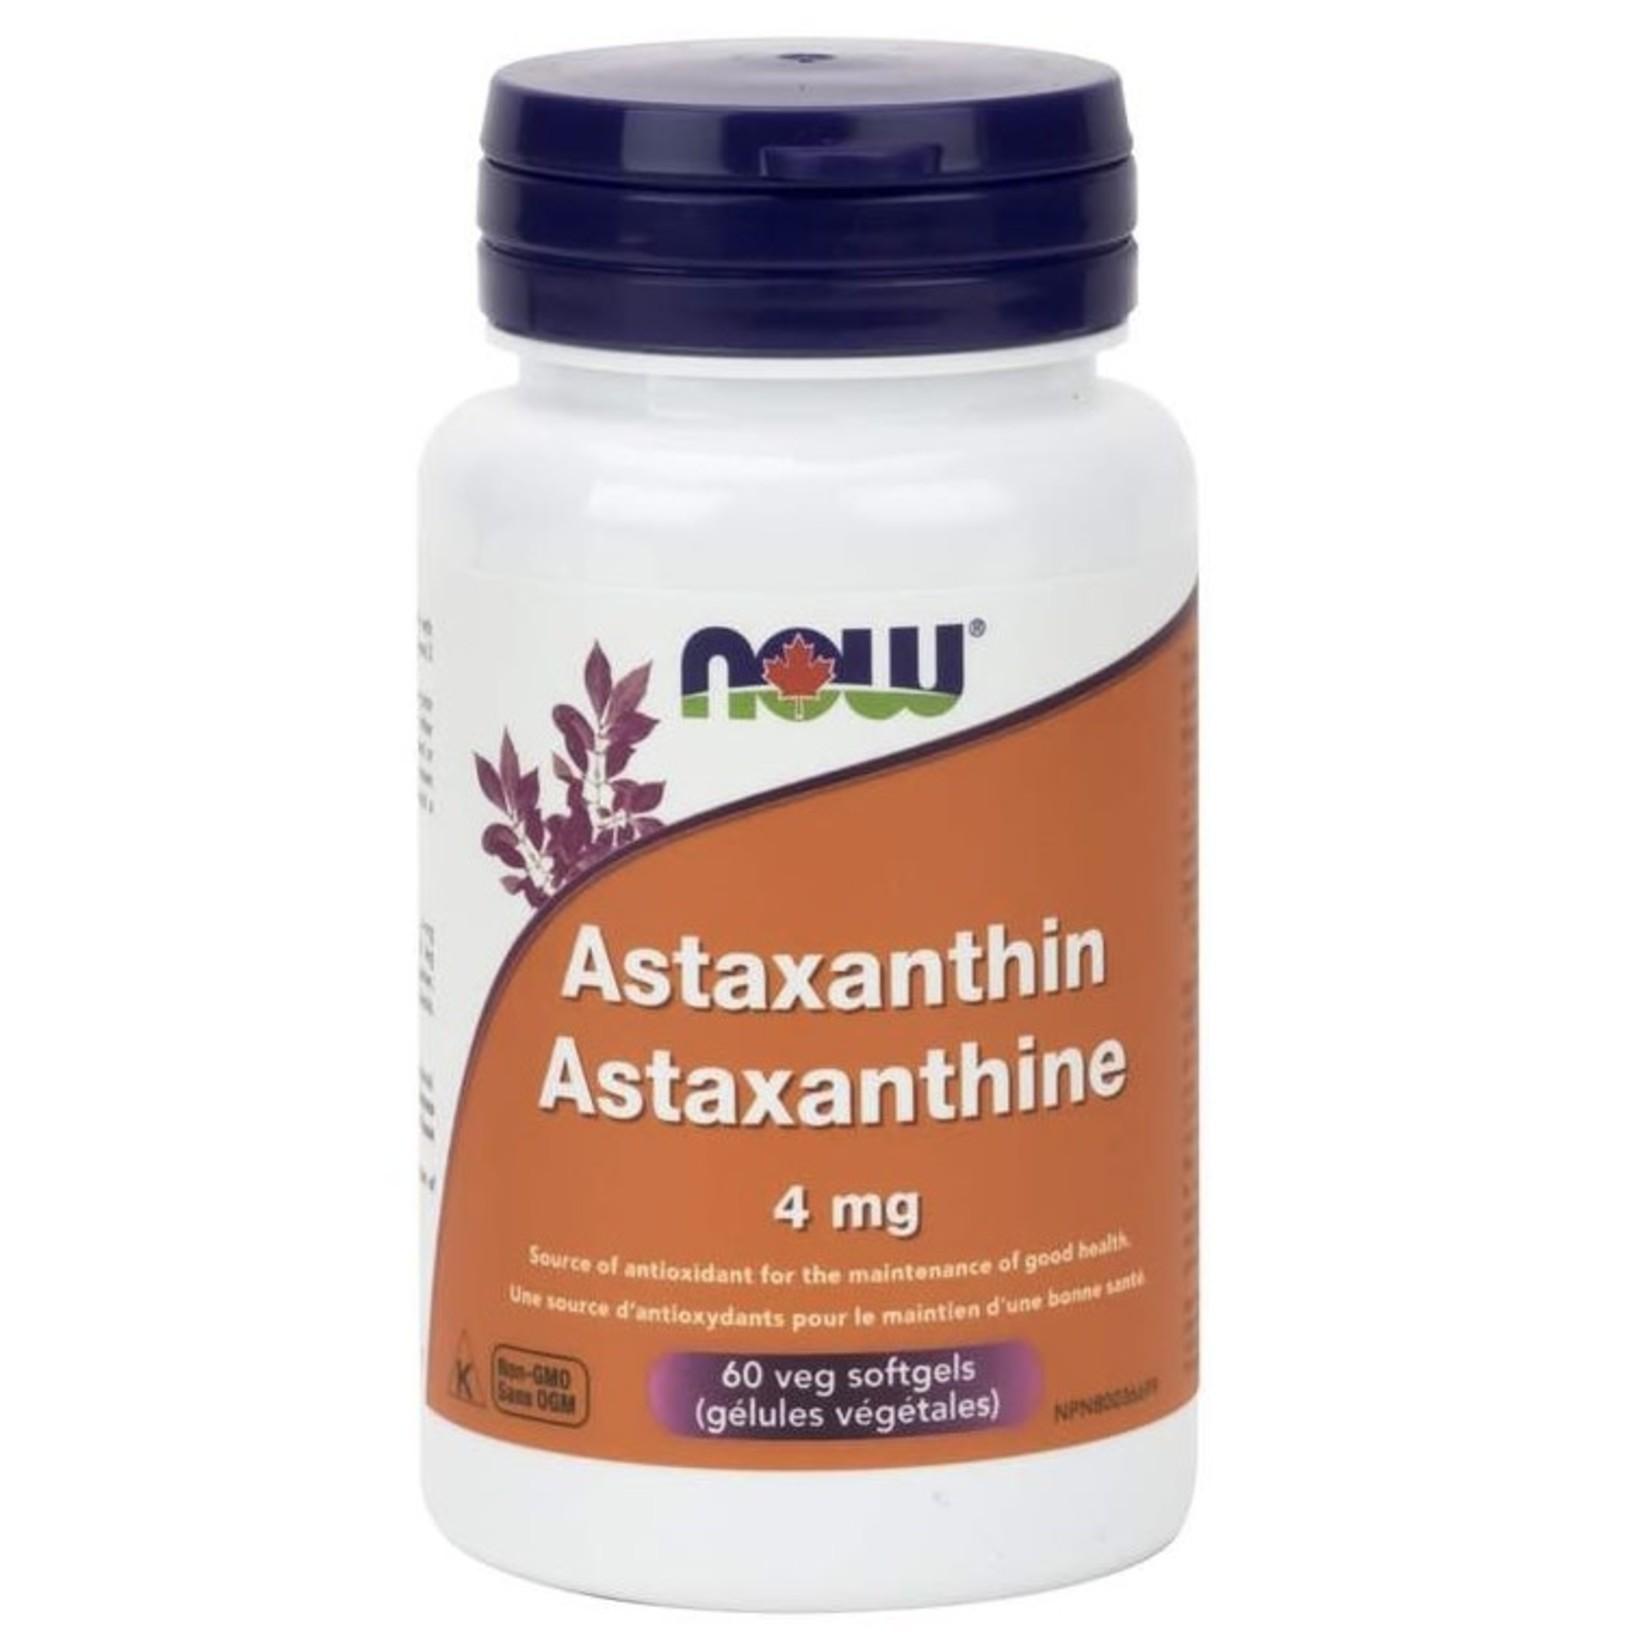 Now Now Astaxanthin 4mg 60 soft gels